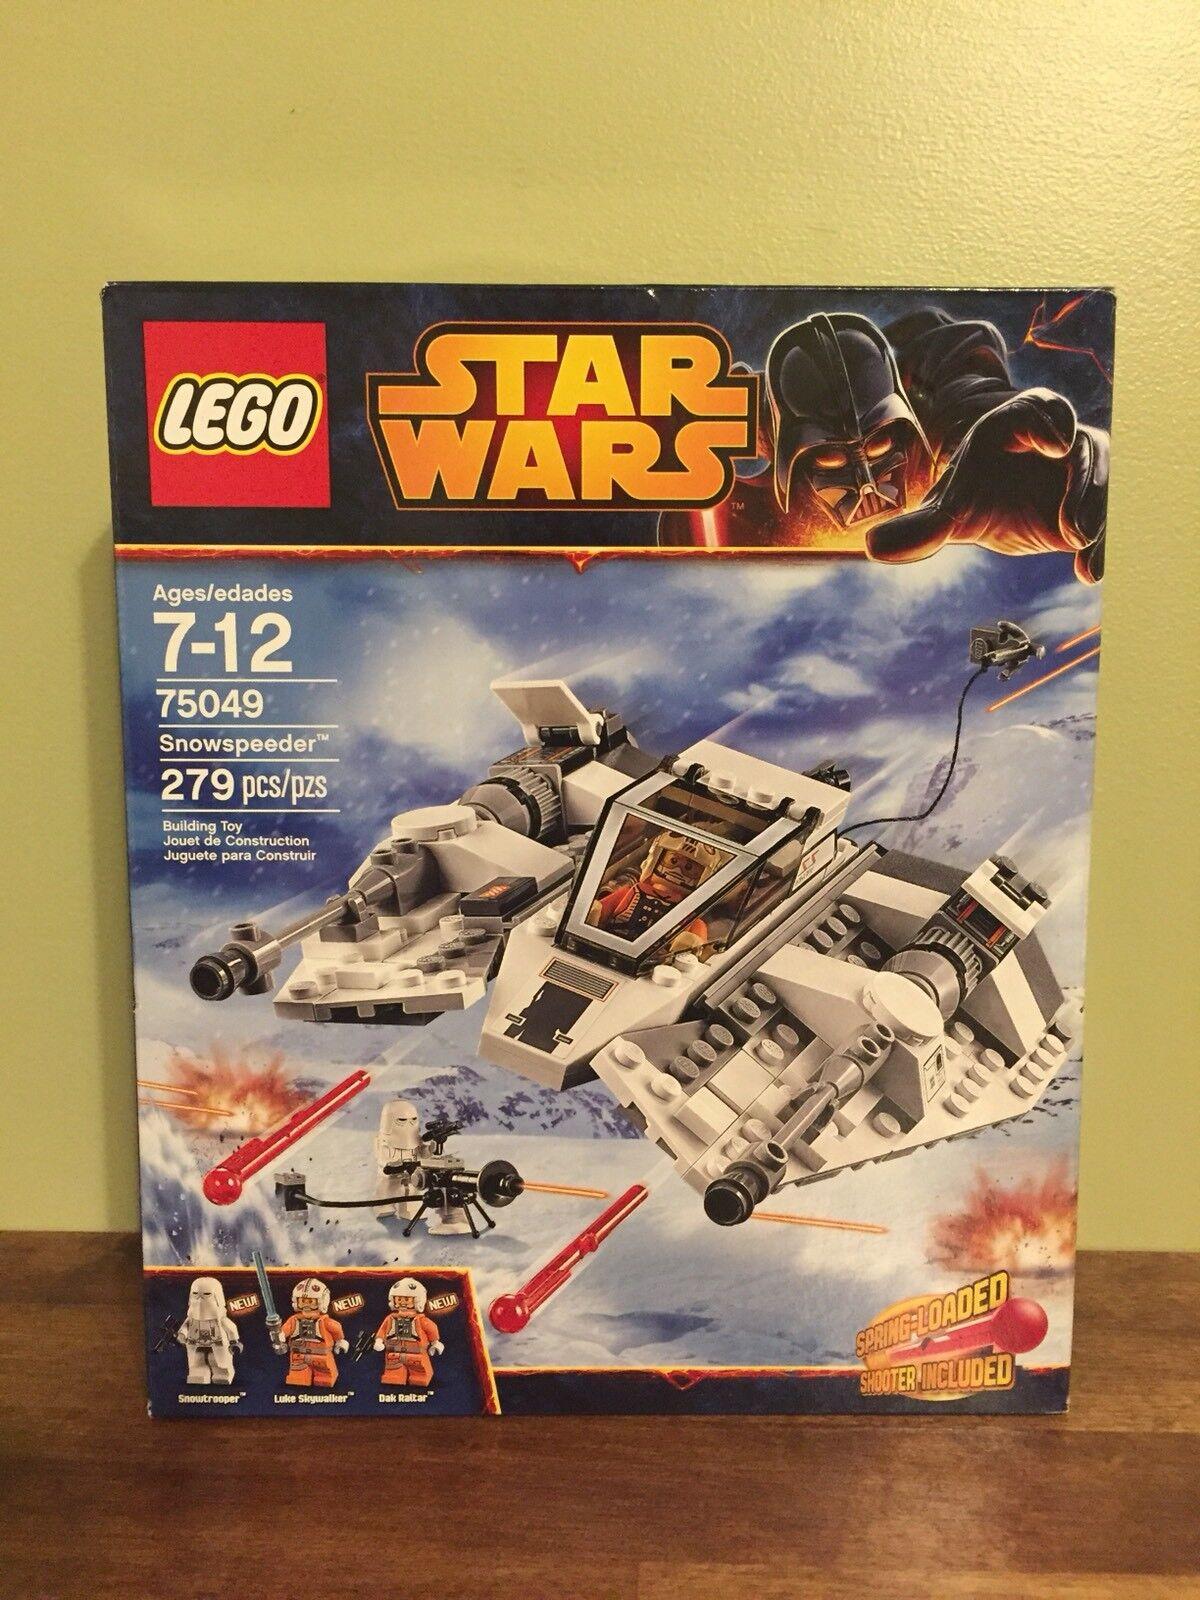 Nuevo Lego Star Wars 75049 Snowspeeder Building Toy Luke DAK RALTAR & Snowtrooper